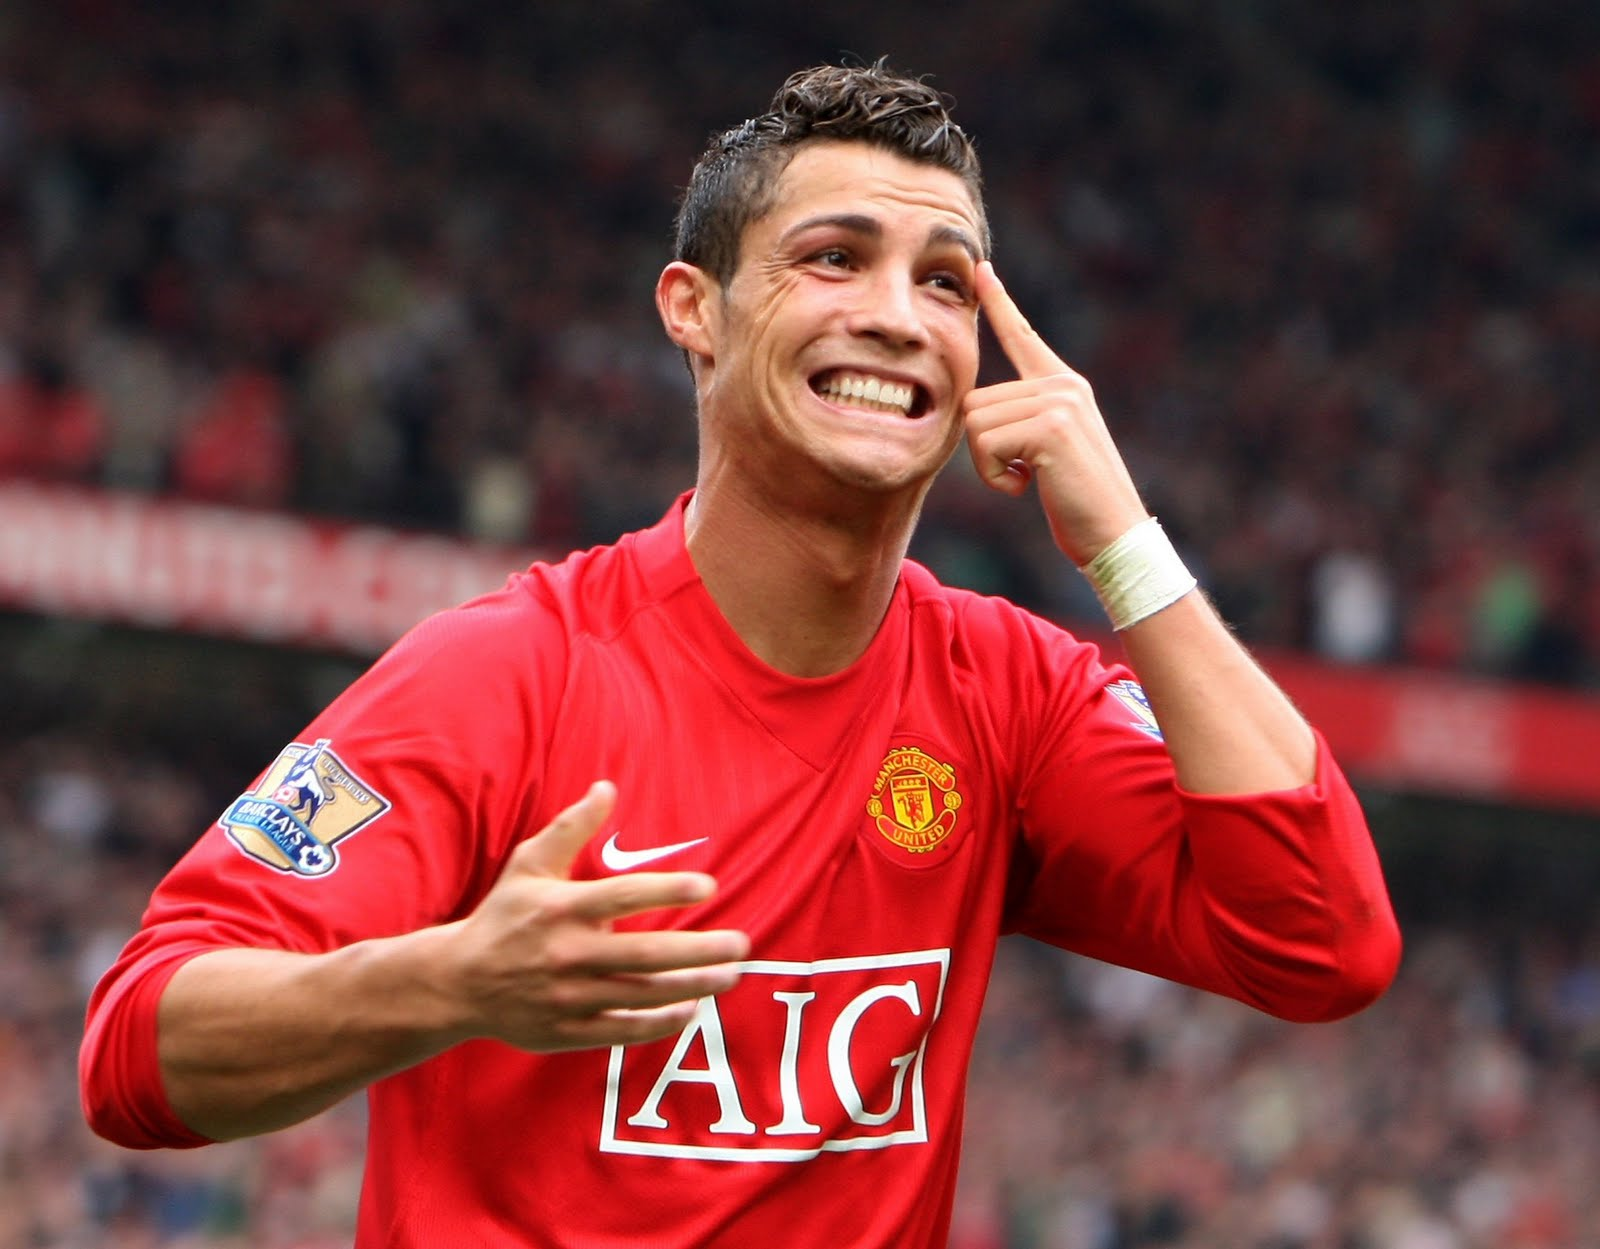 http://2.bp.blogspot.com/-Ubh6ZruUYhY/TkvdjjaeHgI/AAAAAAAAAh8/QTbXAT0Yf2c/s1600/Cristiano-Ronaldo+%252812%2529.jpg